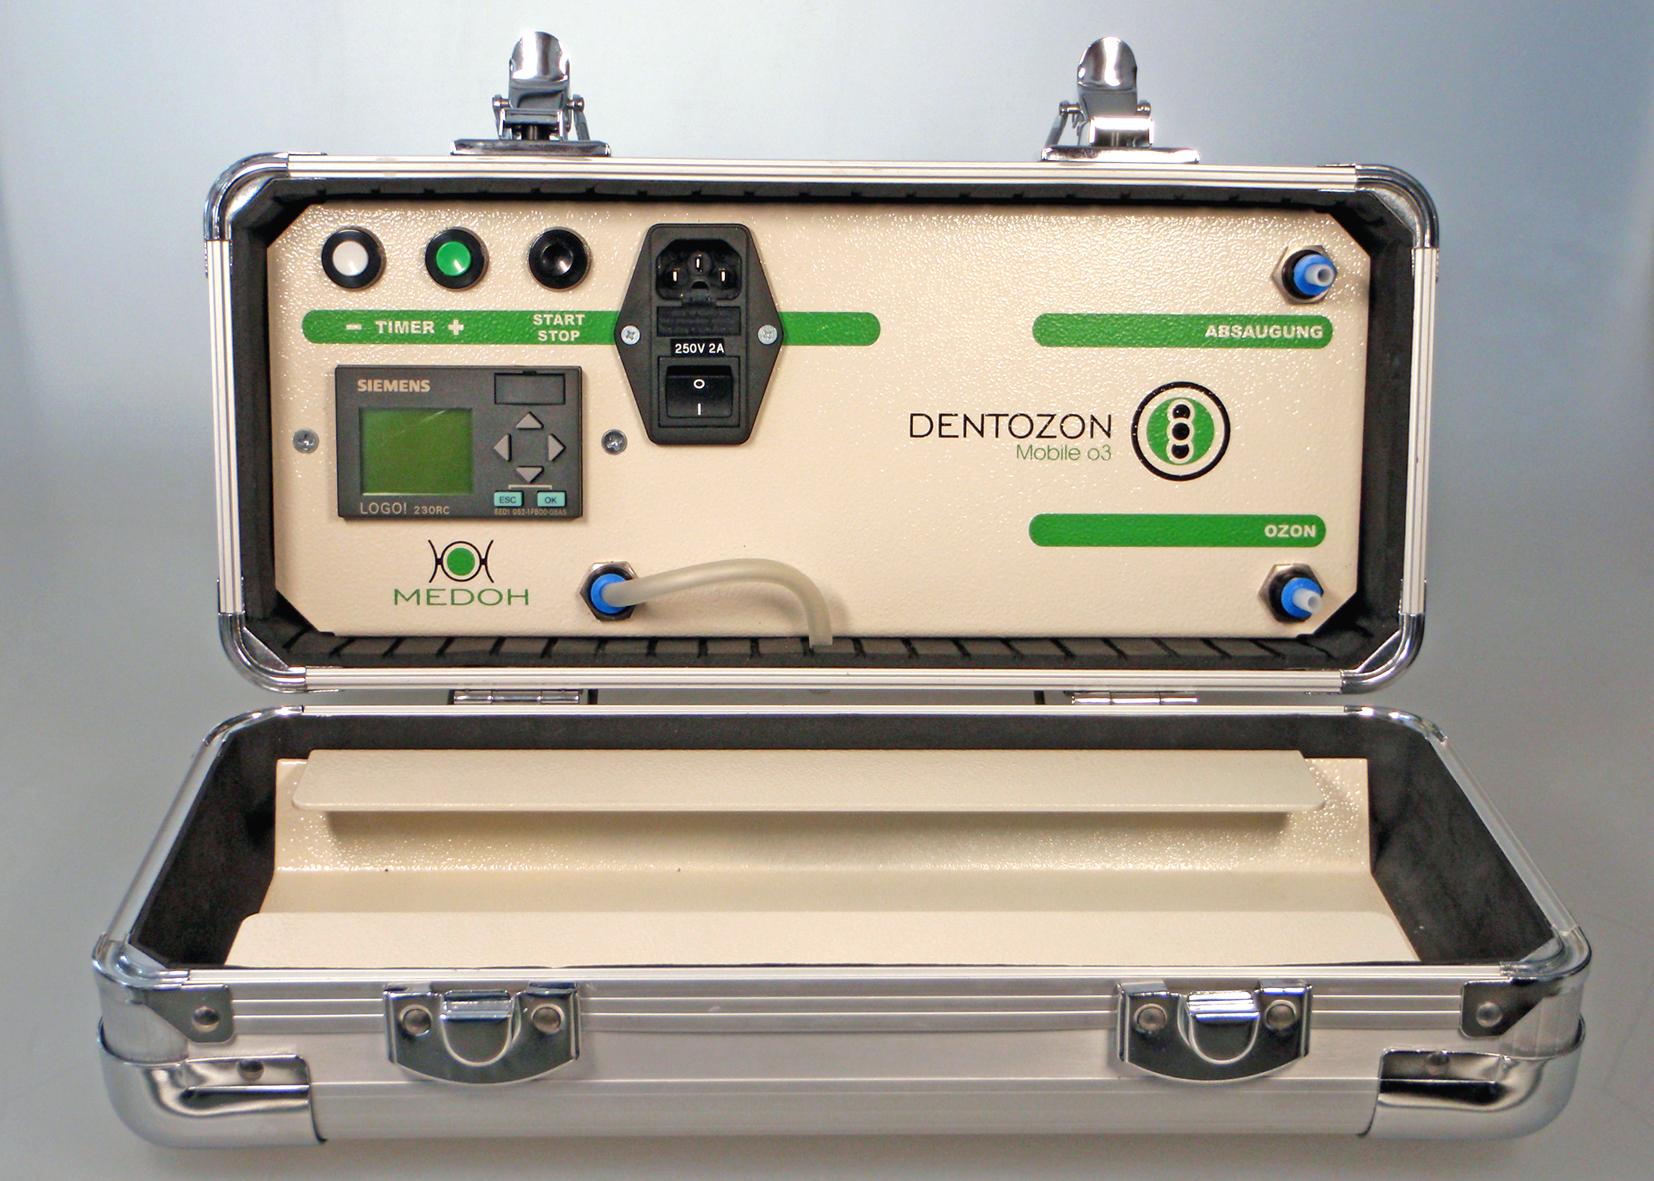 Dentozon mobile 03,Ozonanwendung in der Ozontherapie chitodent-vertrieb.de